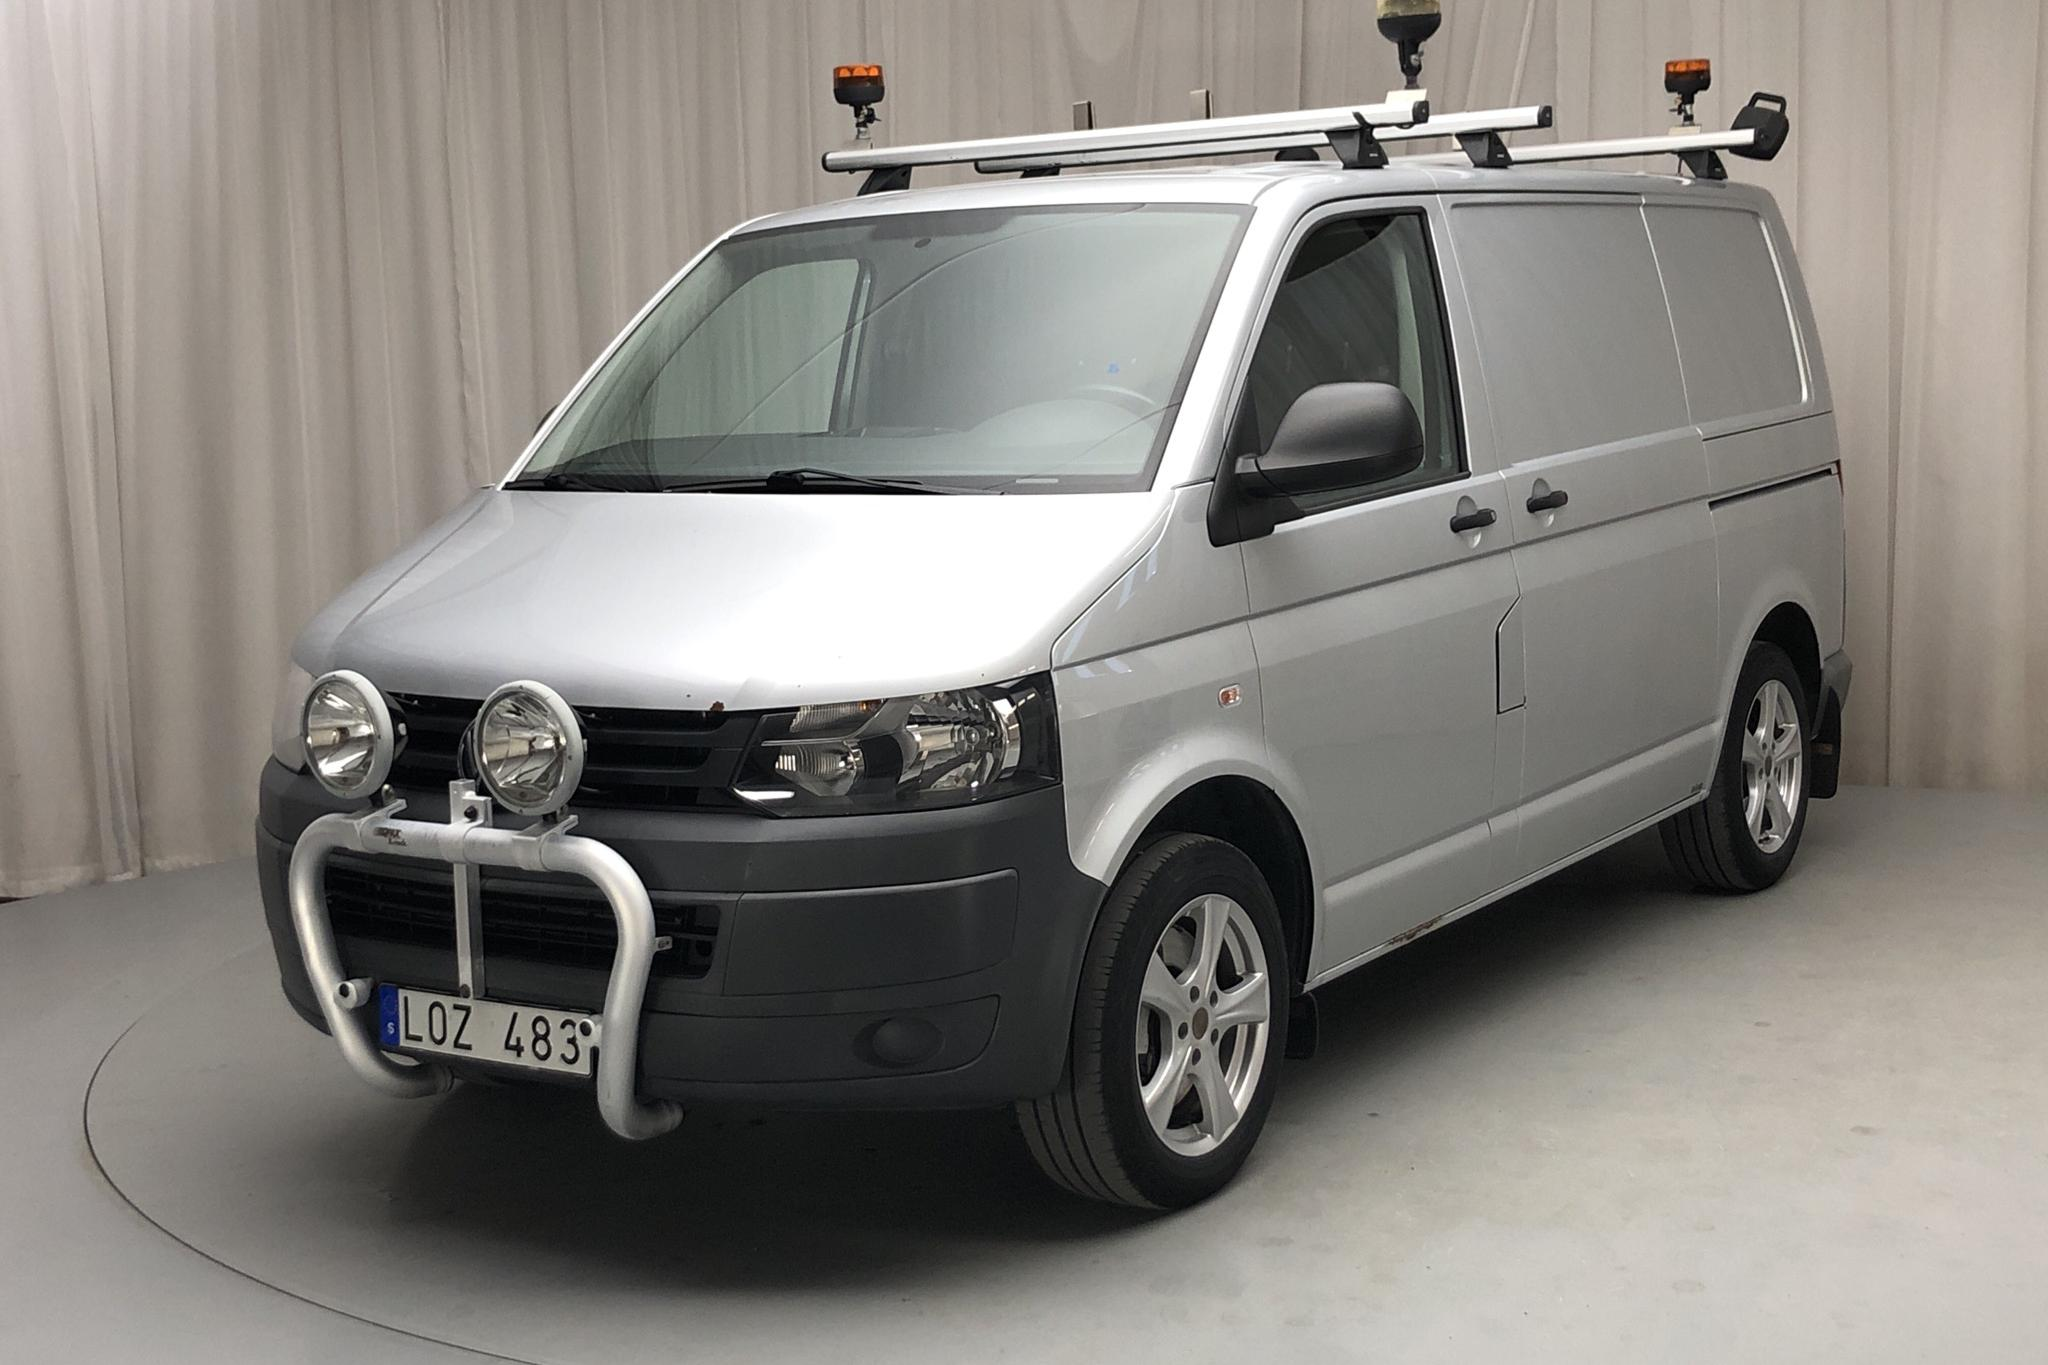 VW Transporter T5 2.0 TDI 4MOTION (180hk) - 107 900 km - Automatic - silver - 2011